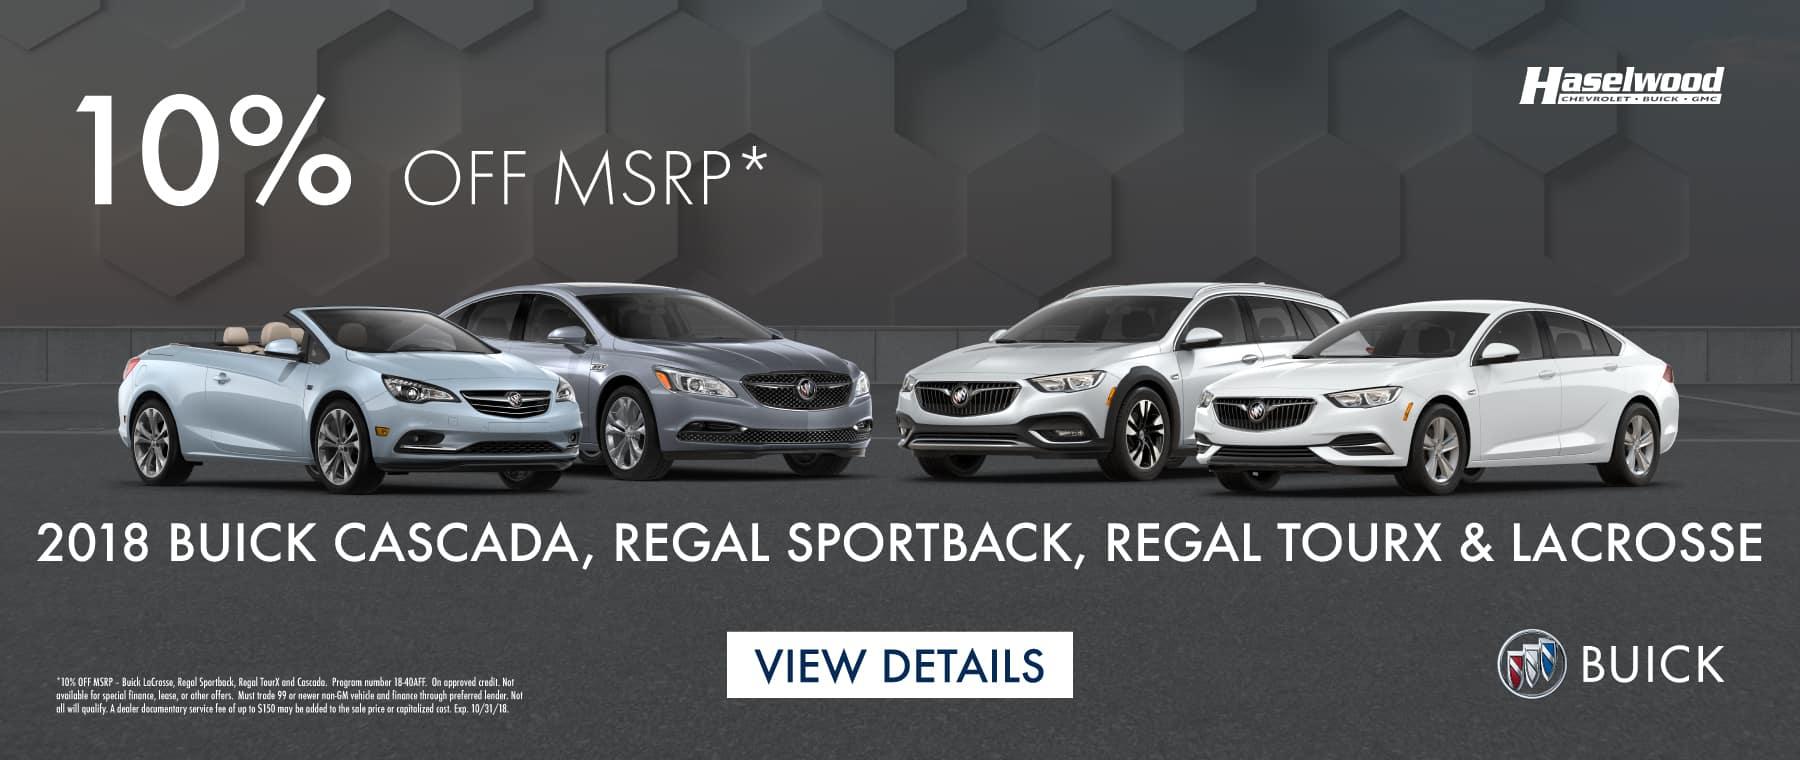 2018 Buick LaCrosse, Regal Sportback, Regal TourX and Cascada 10% OFF MSRP